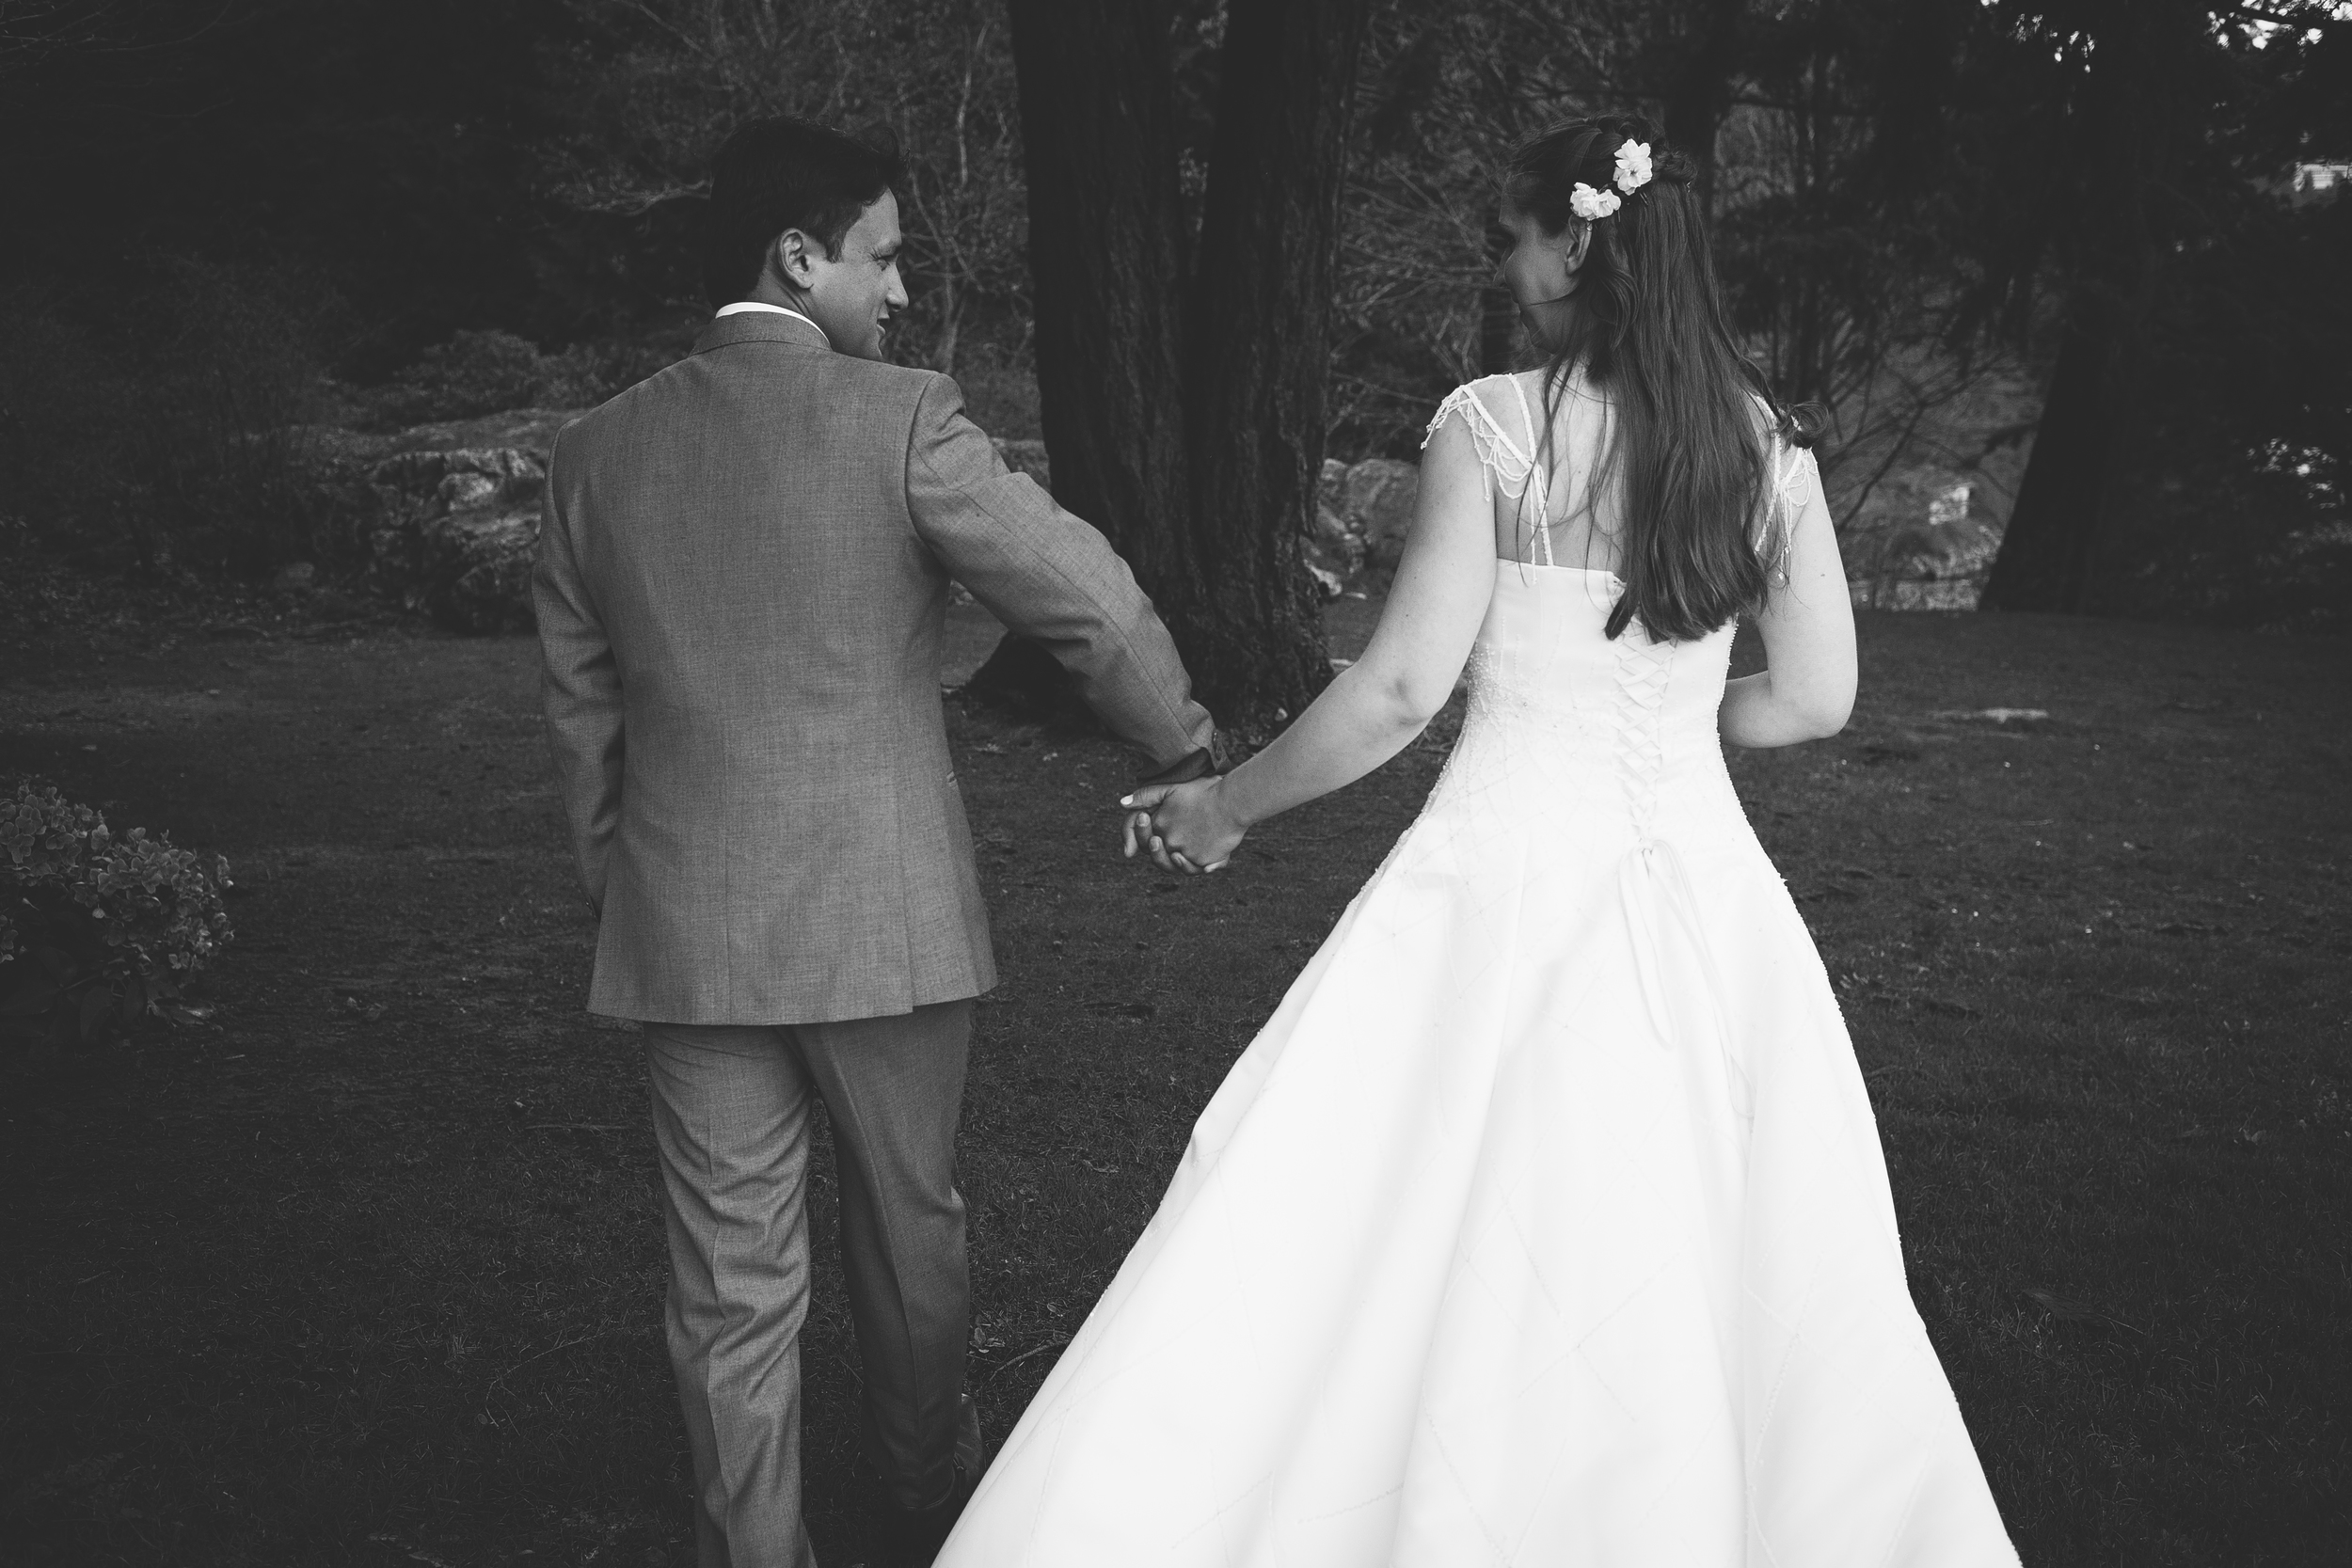 vancouver_photographer_wedding_DogwoodPhotography-20.jpg